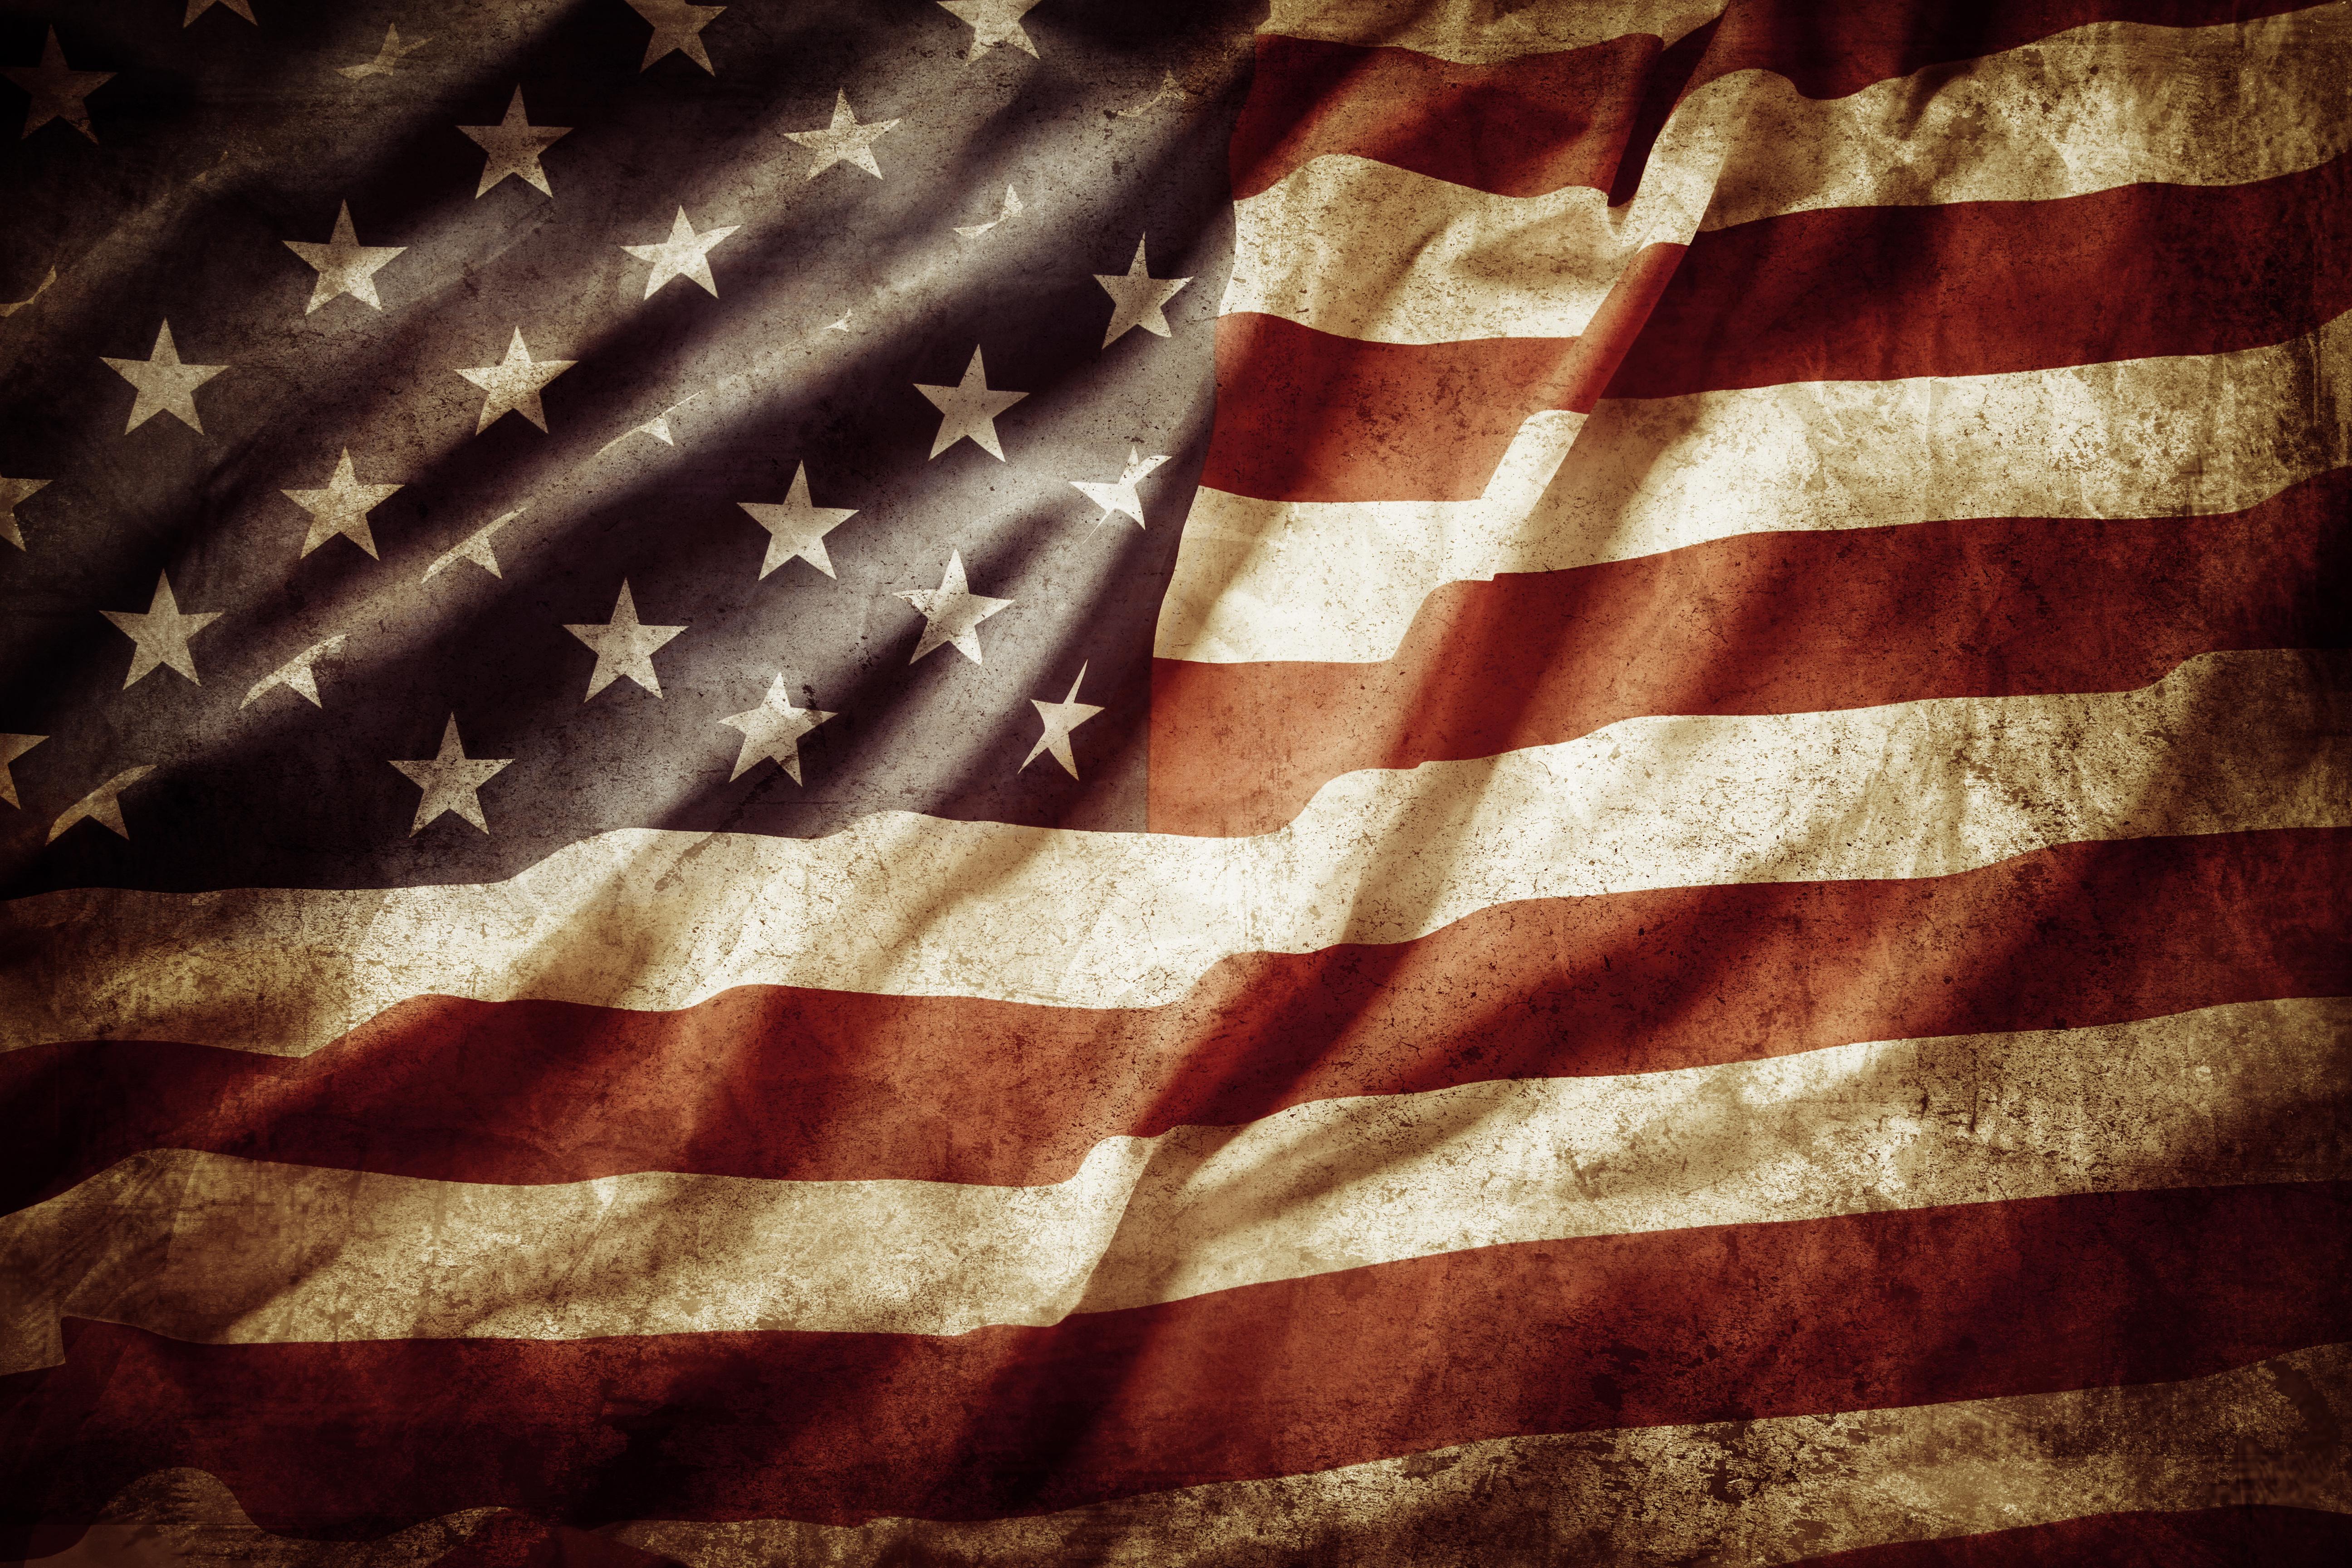 American flag 5k retina ultra hd wallpaper background - American flag hd ...